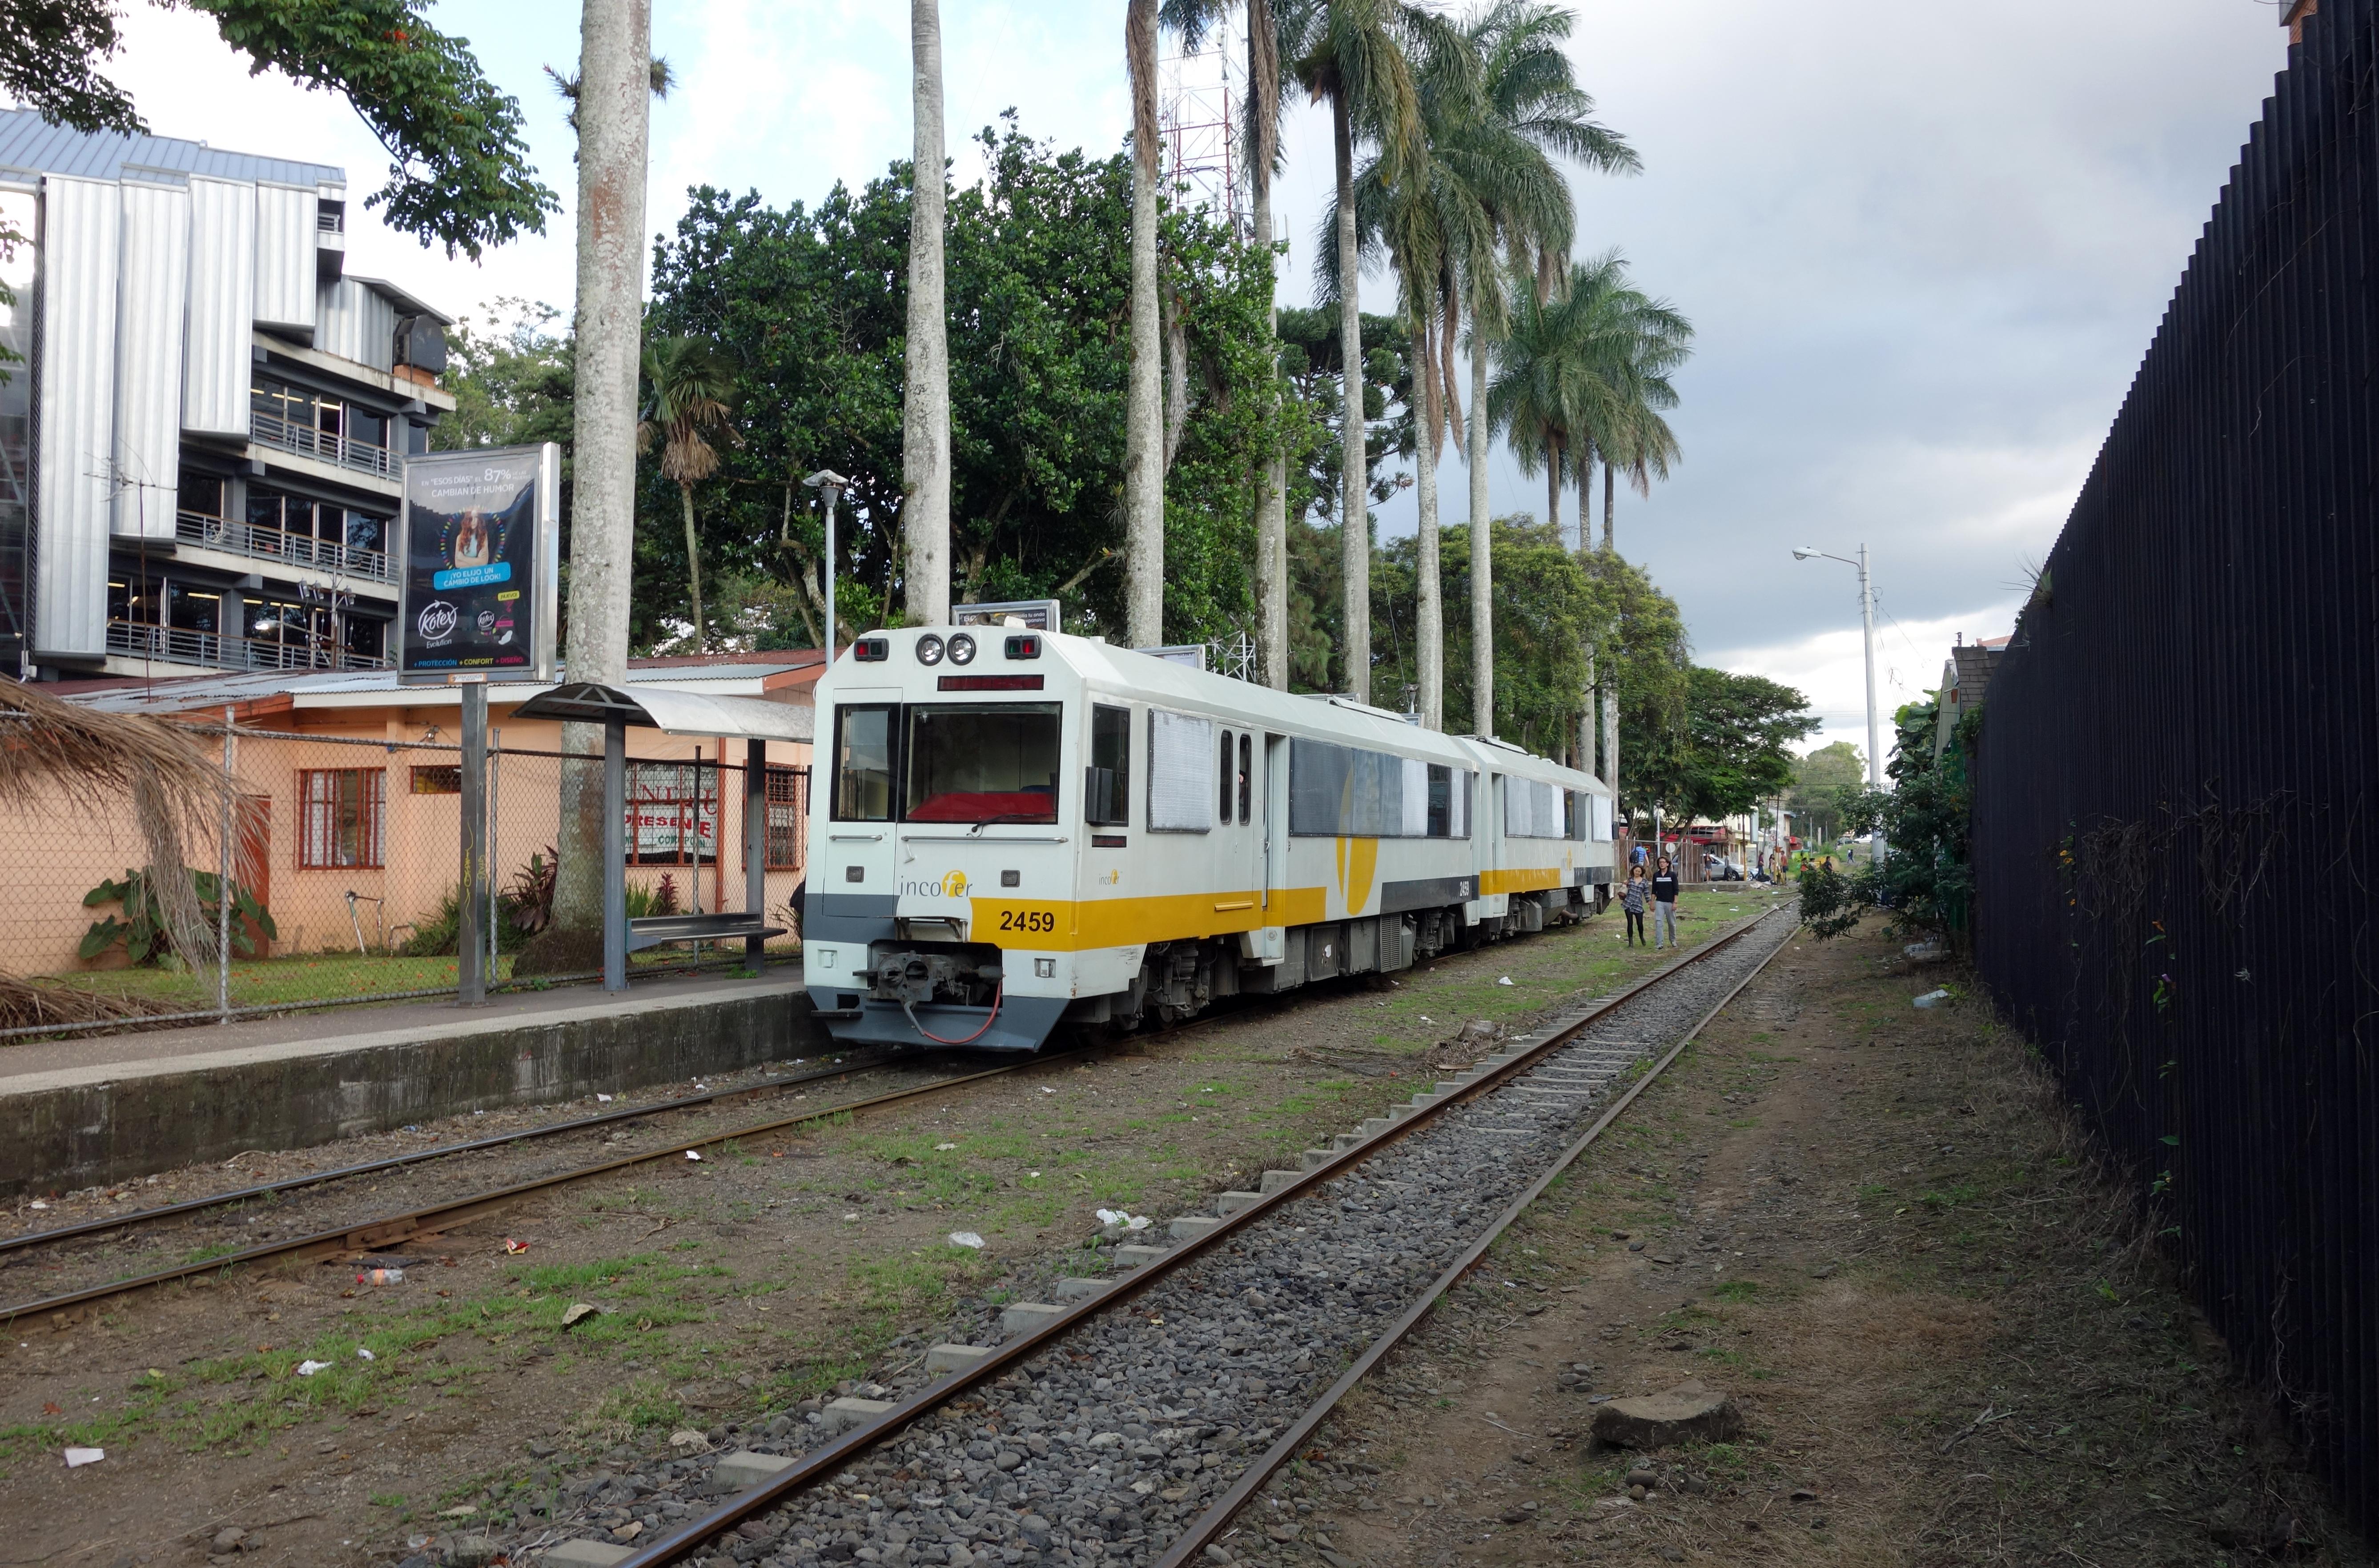 Tren Urbano Logo File:tren Urbano de Costa